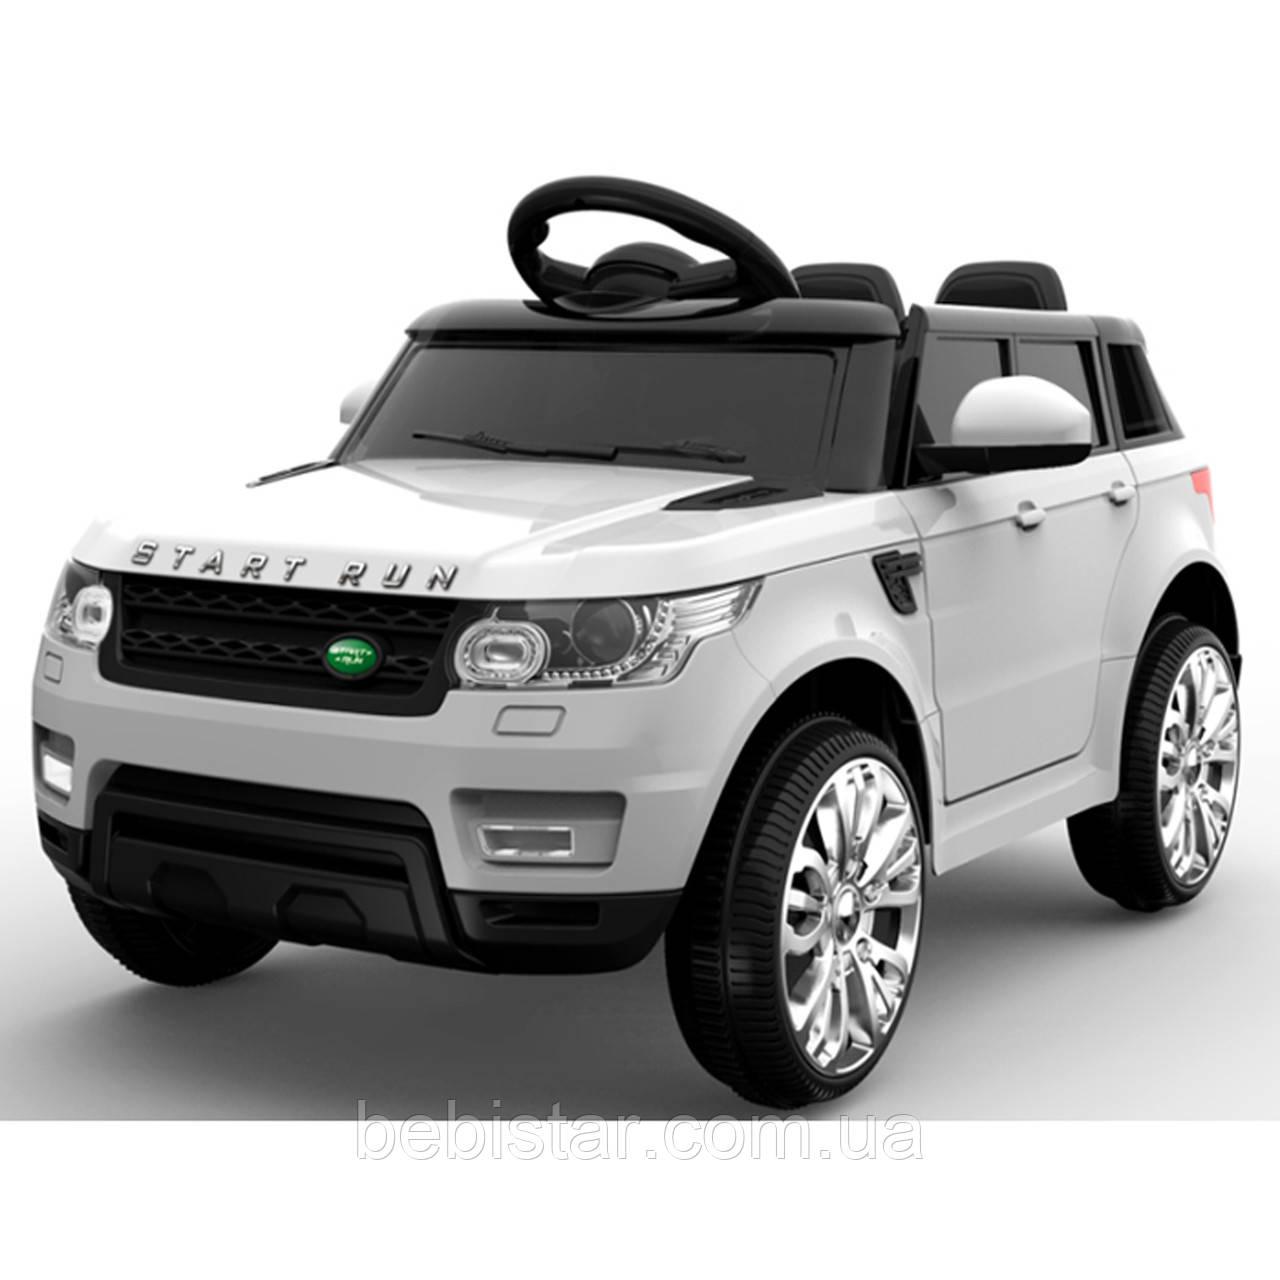 Детский электромобиль белый FL1638 (T-7815) WHITE деткам 3-8 лет